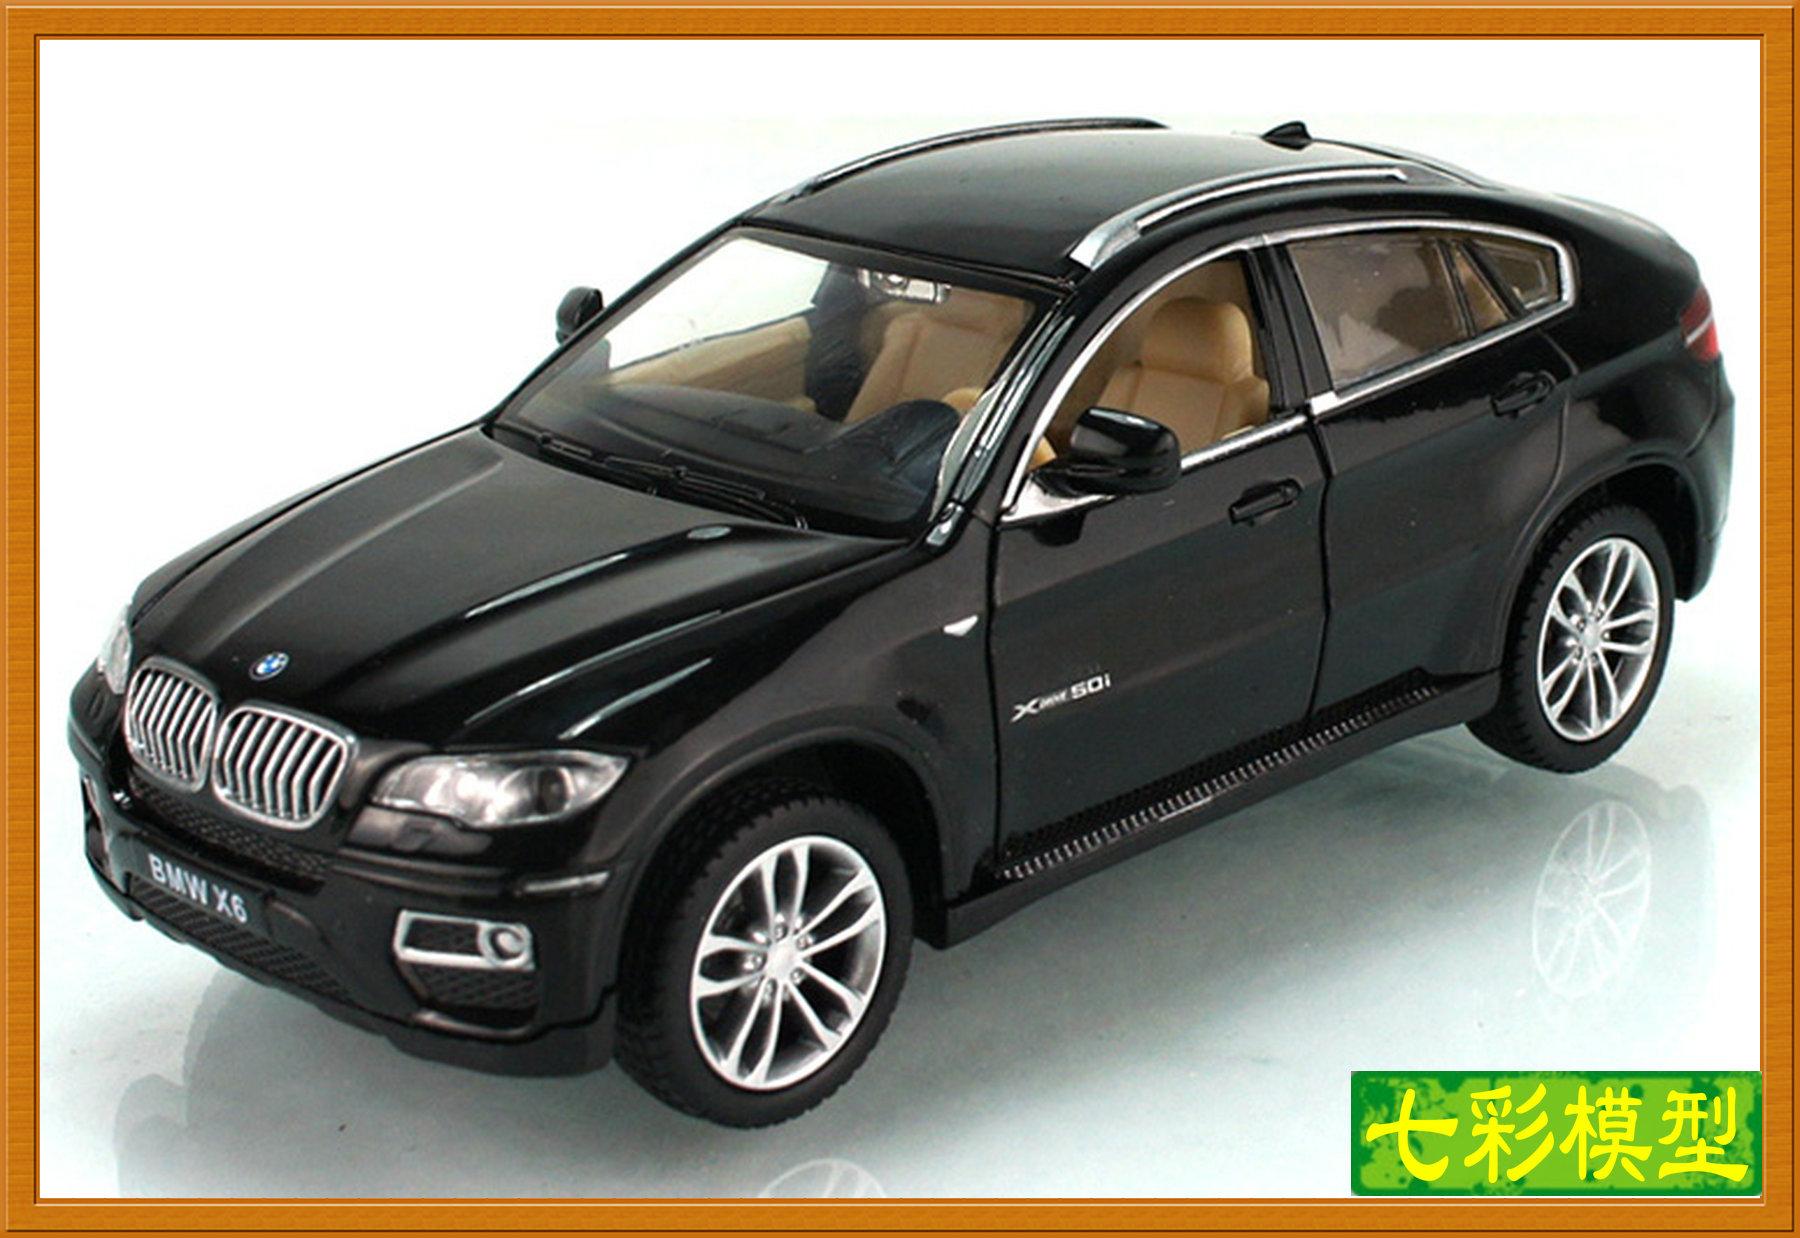 [elegance] alloy model car CAIPO static simulation 1:32 BMW X6 warrior acousto-optic toy vehicle